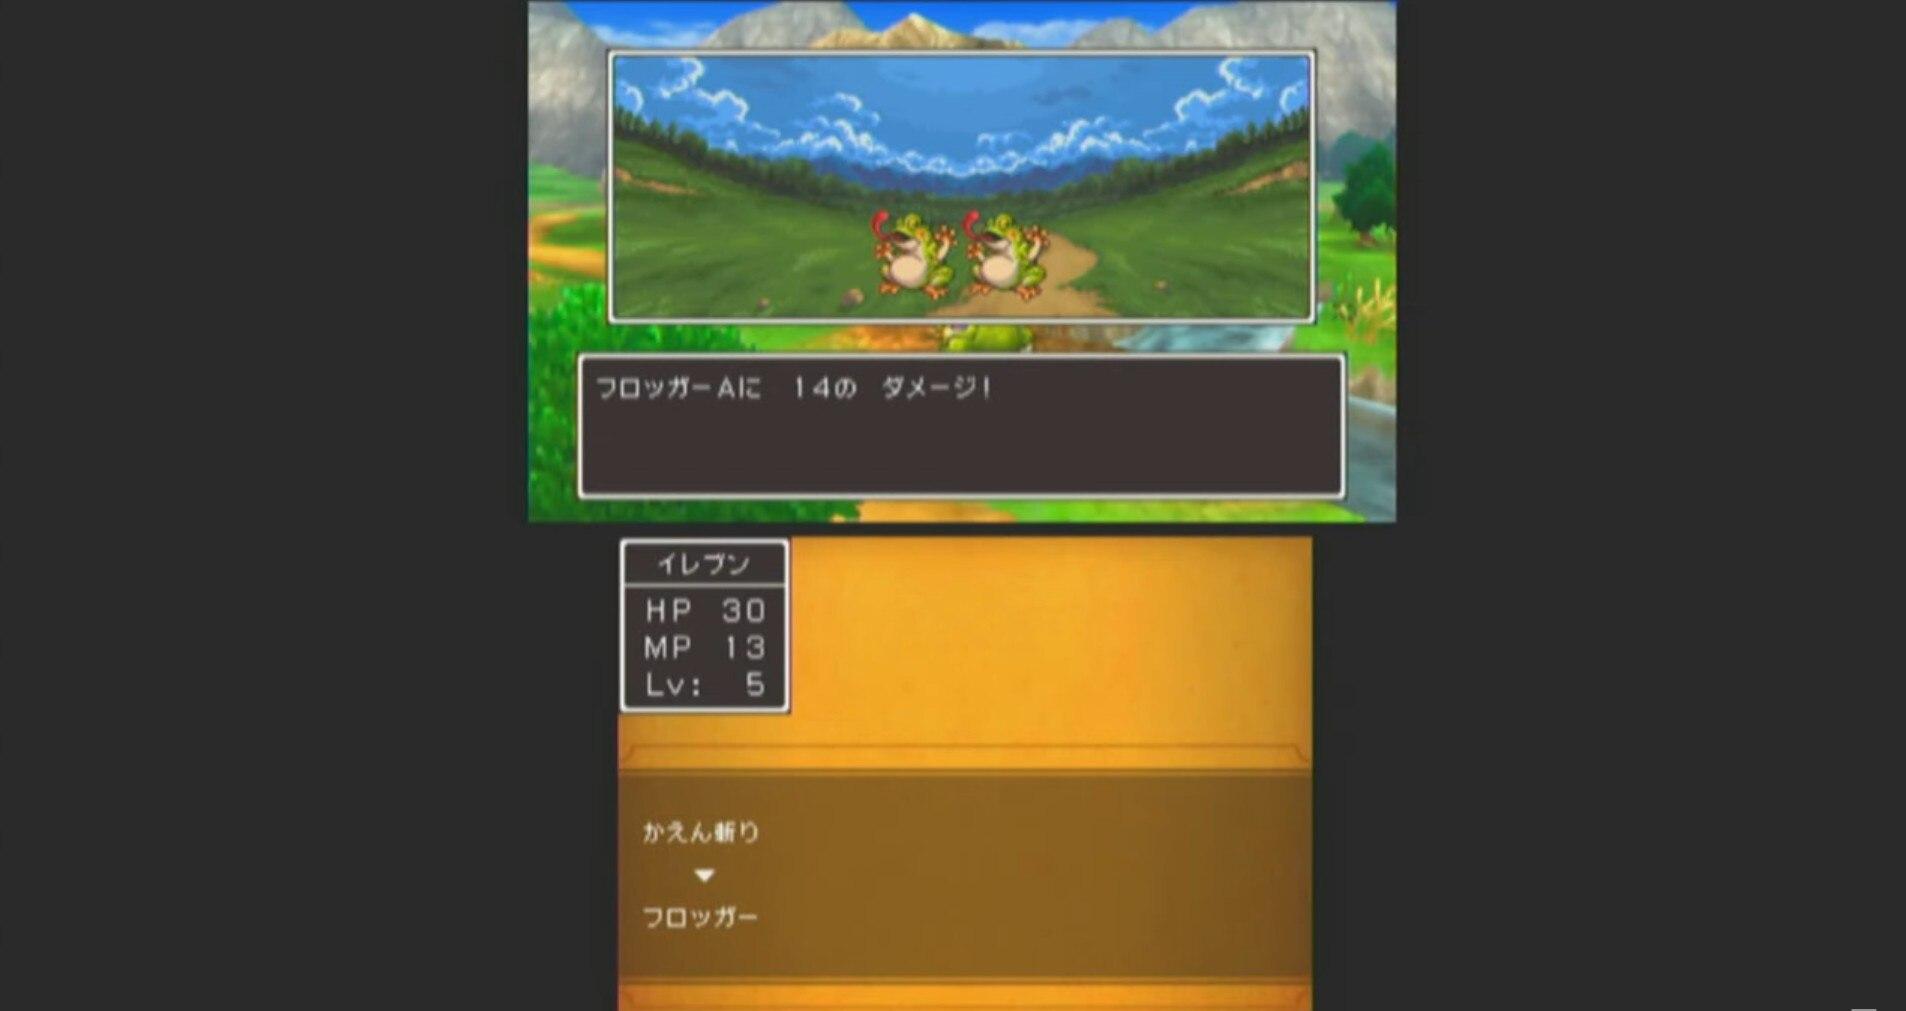 2D画面での戦闘